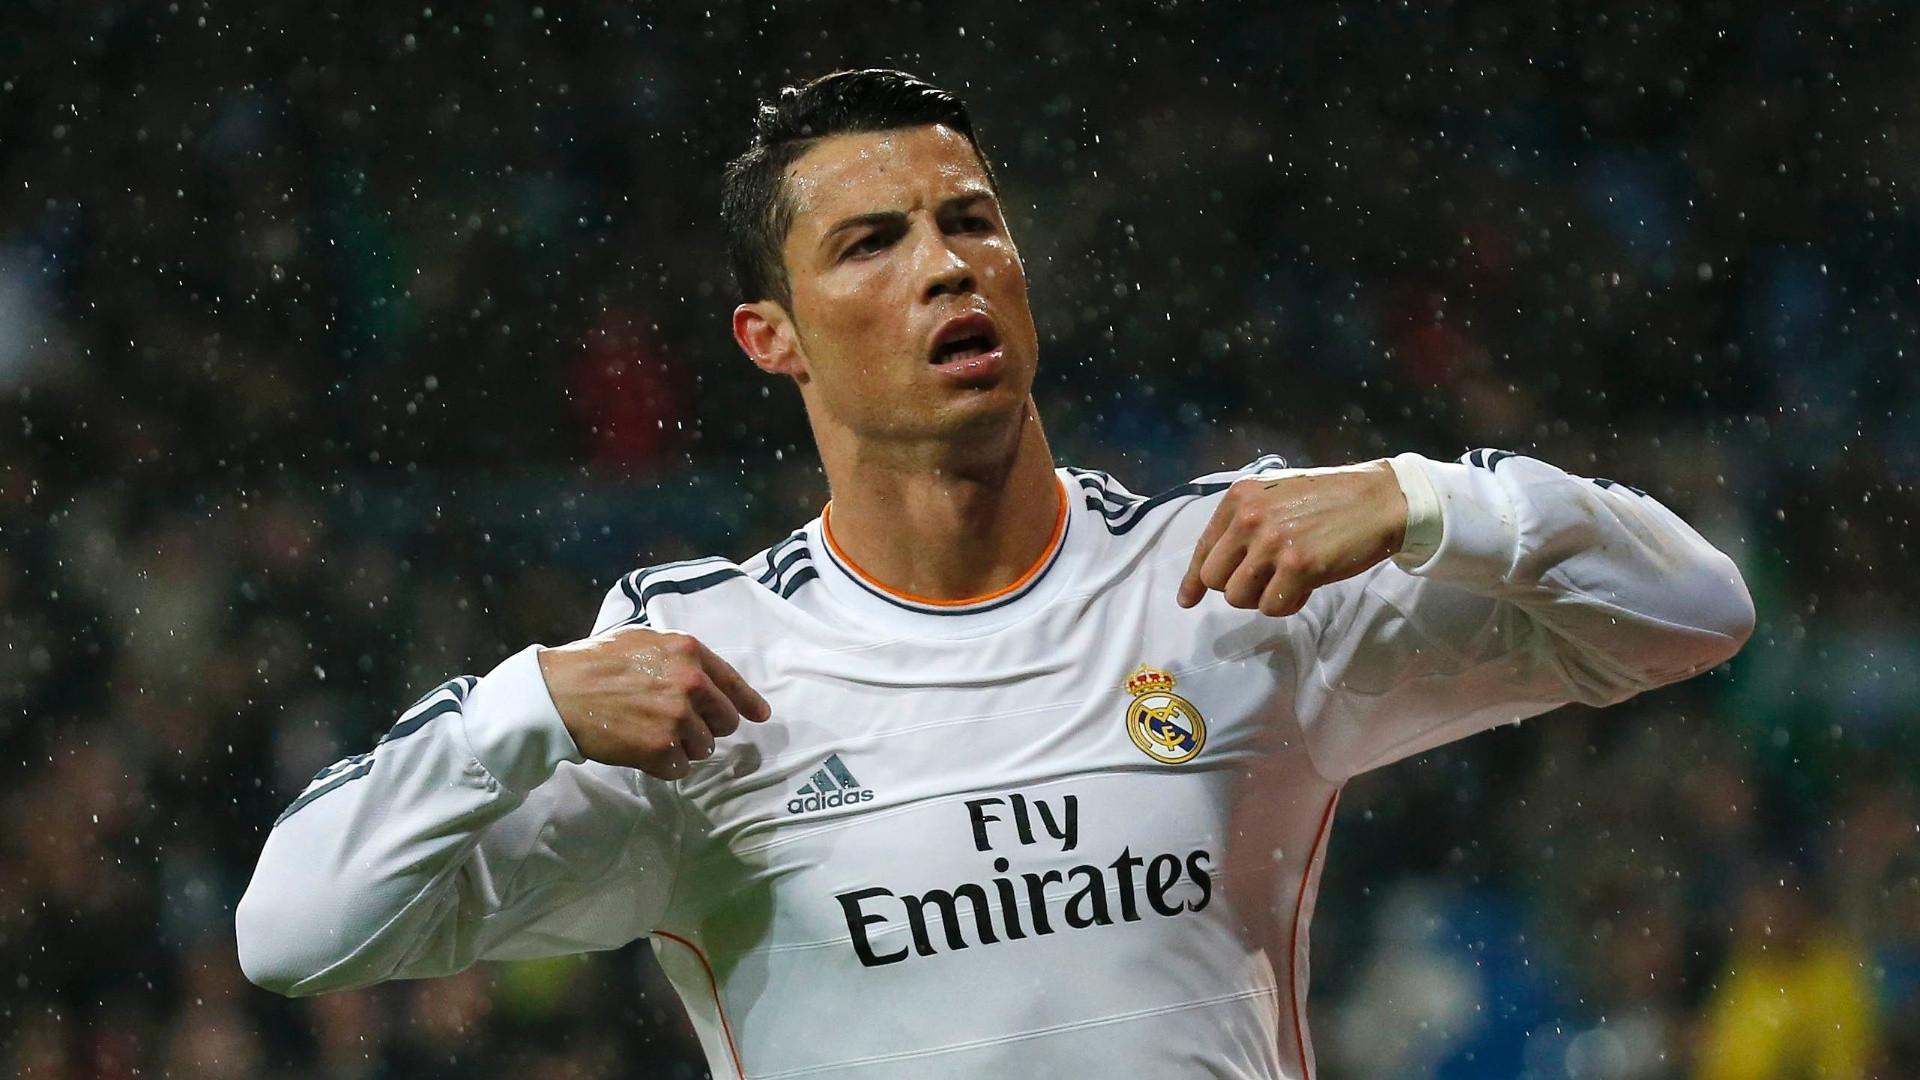 Cristiano Ronaldo Wallpapers 1080 – HD Wallpaper